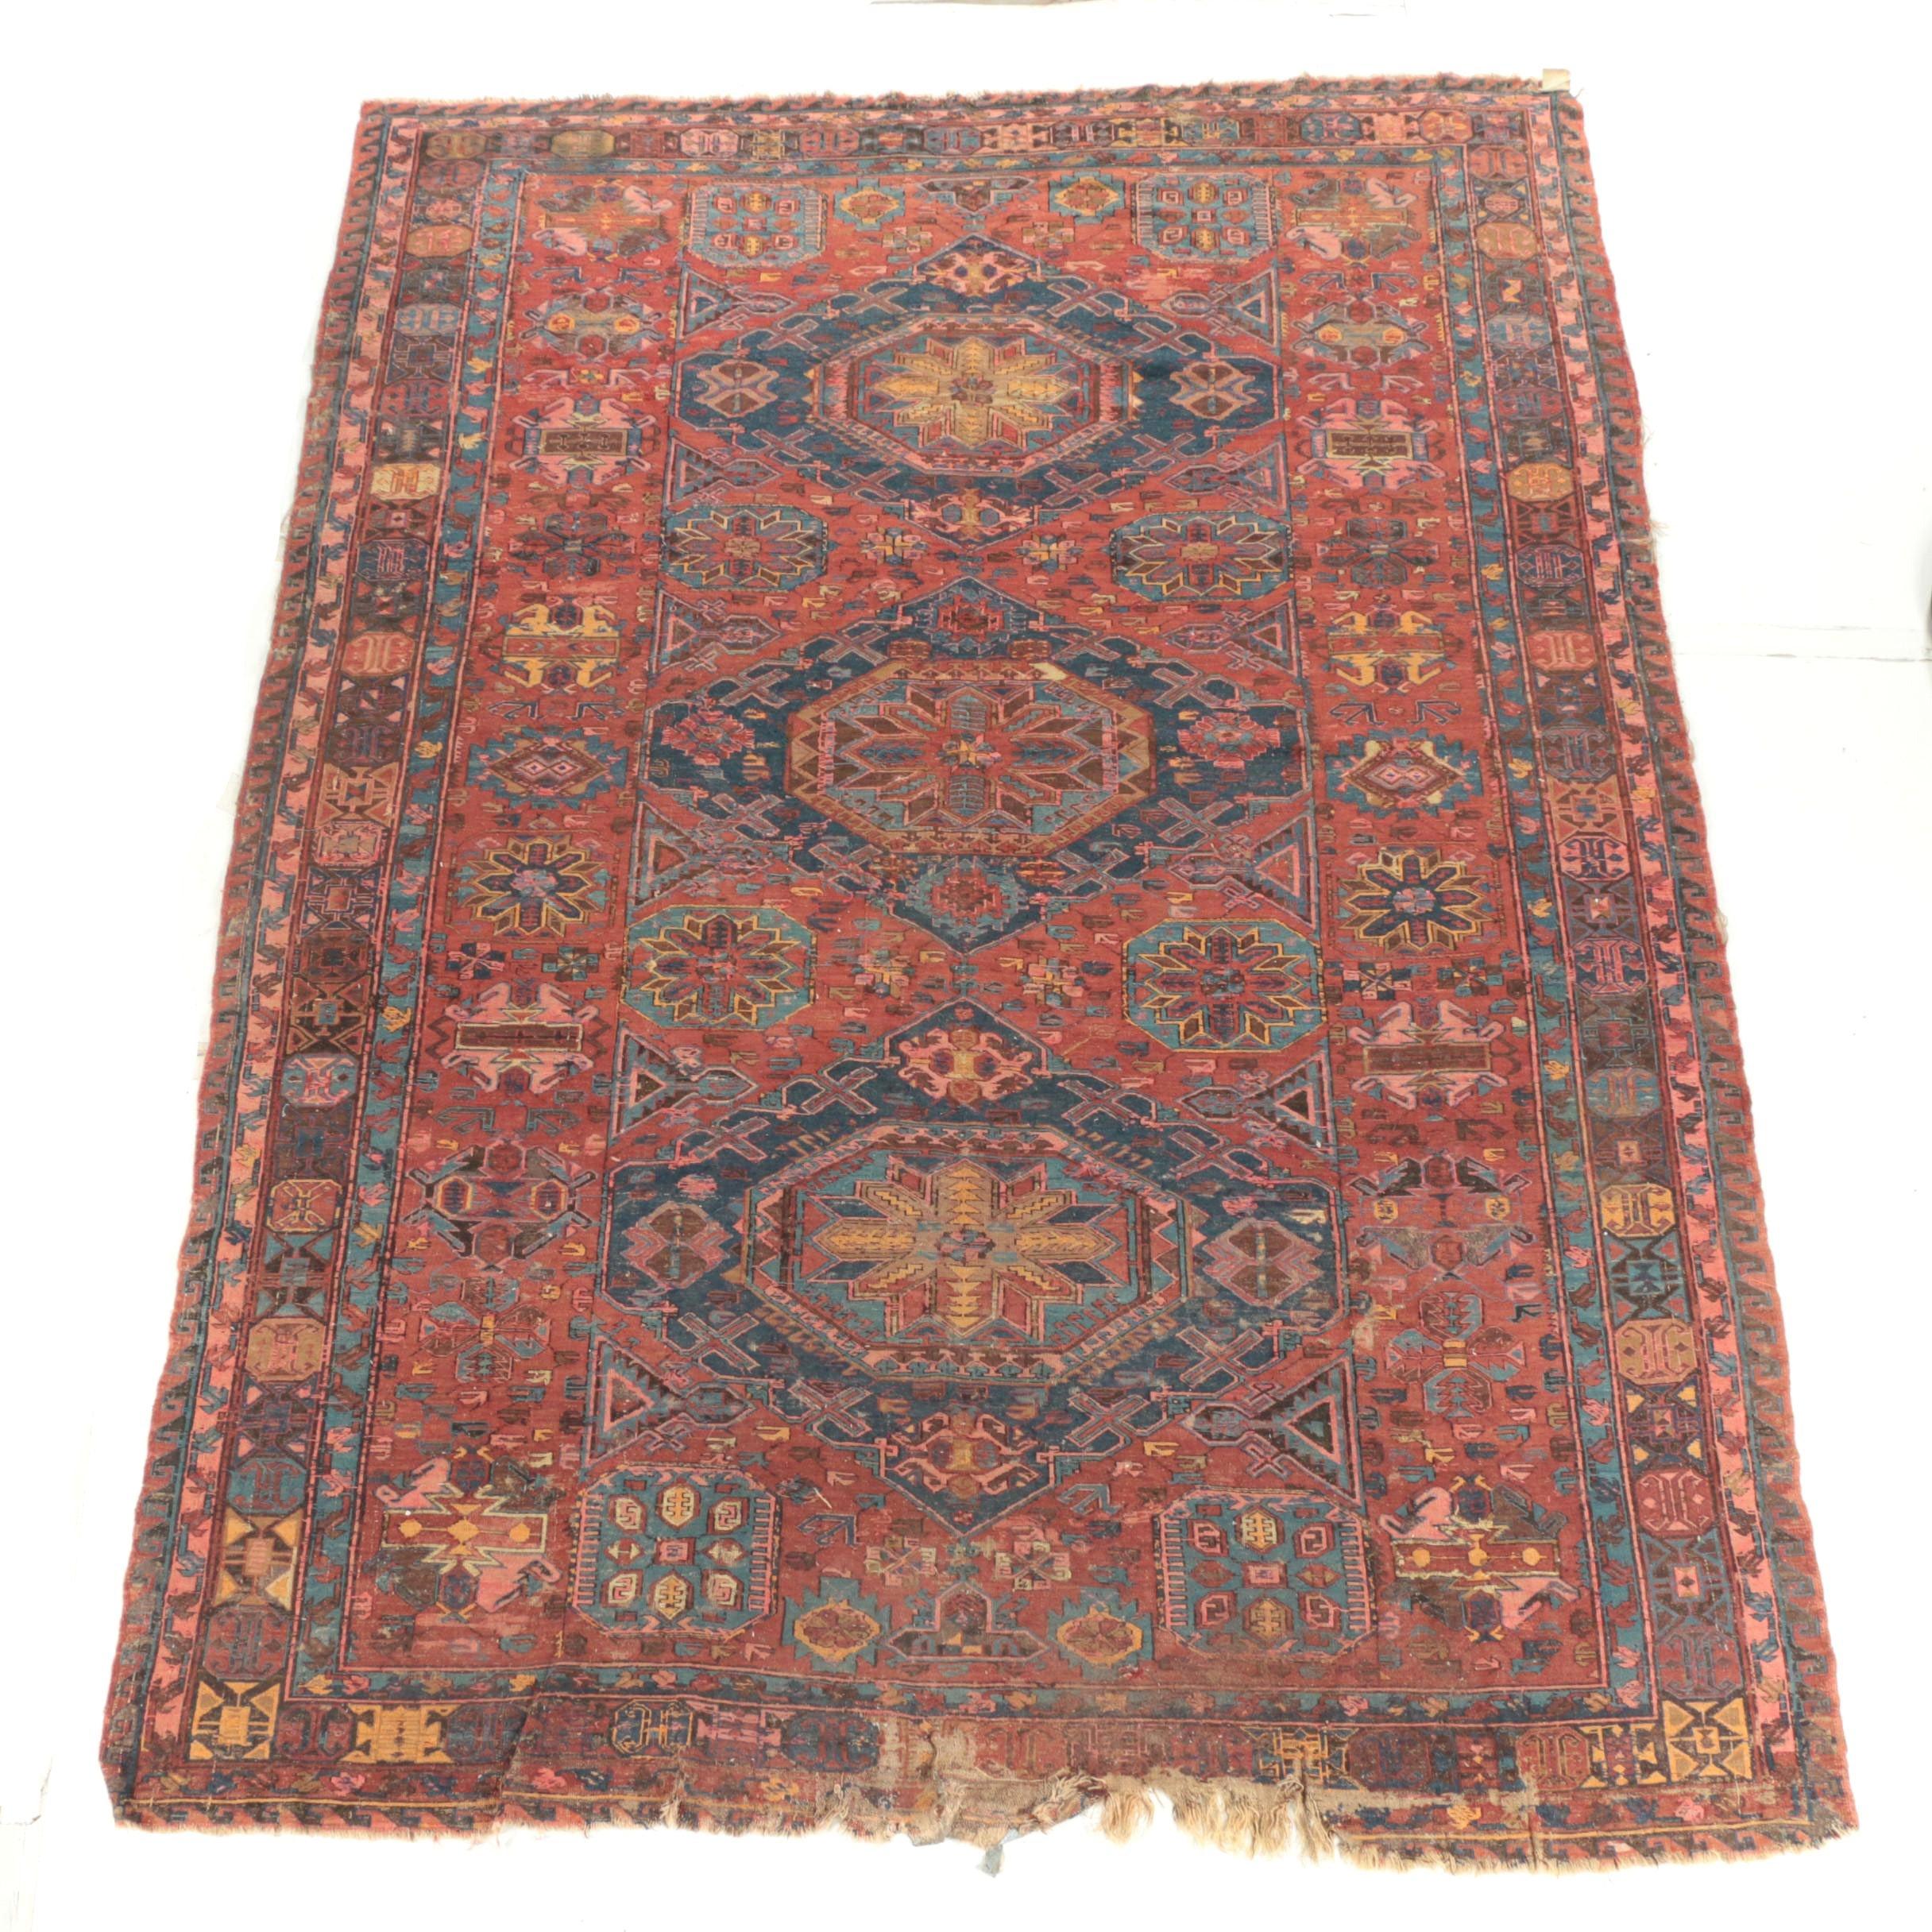 Semi-Antique Handwoven Caucasian Wool Soumak Room Sized Rug